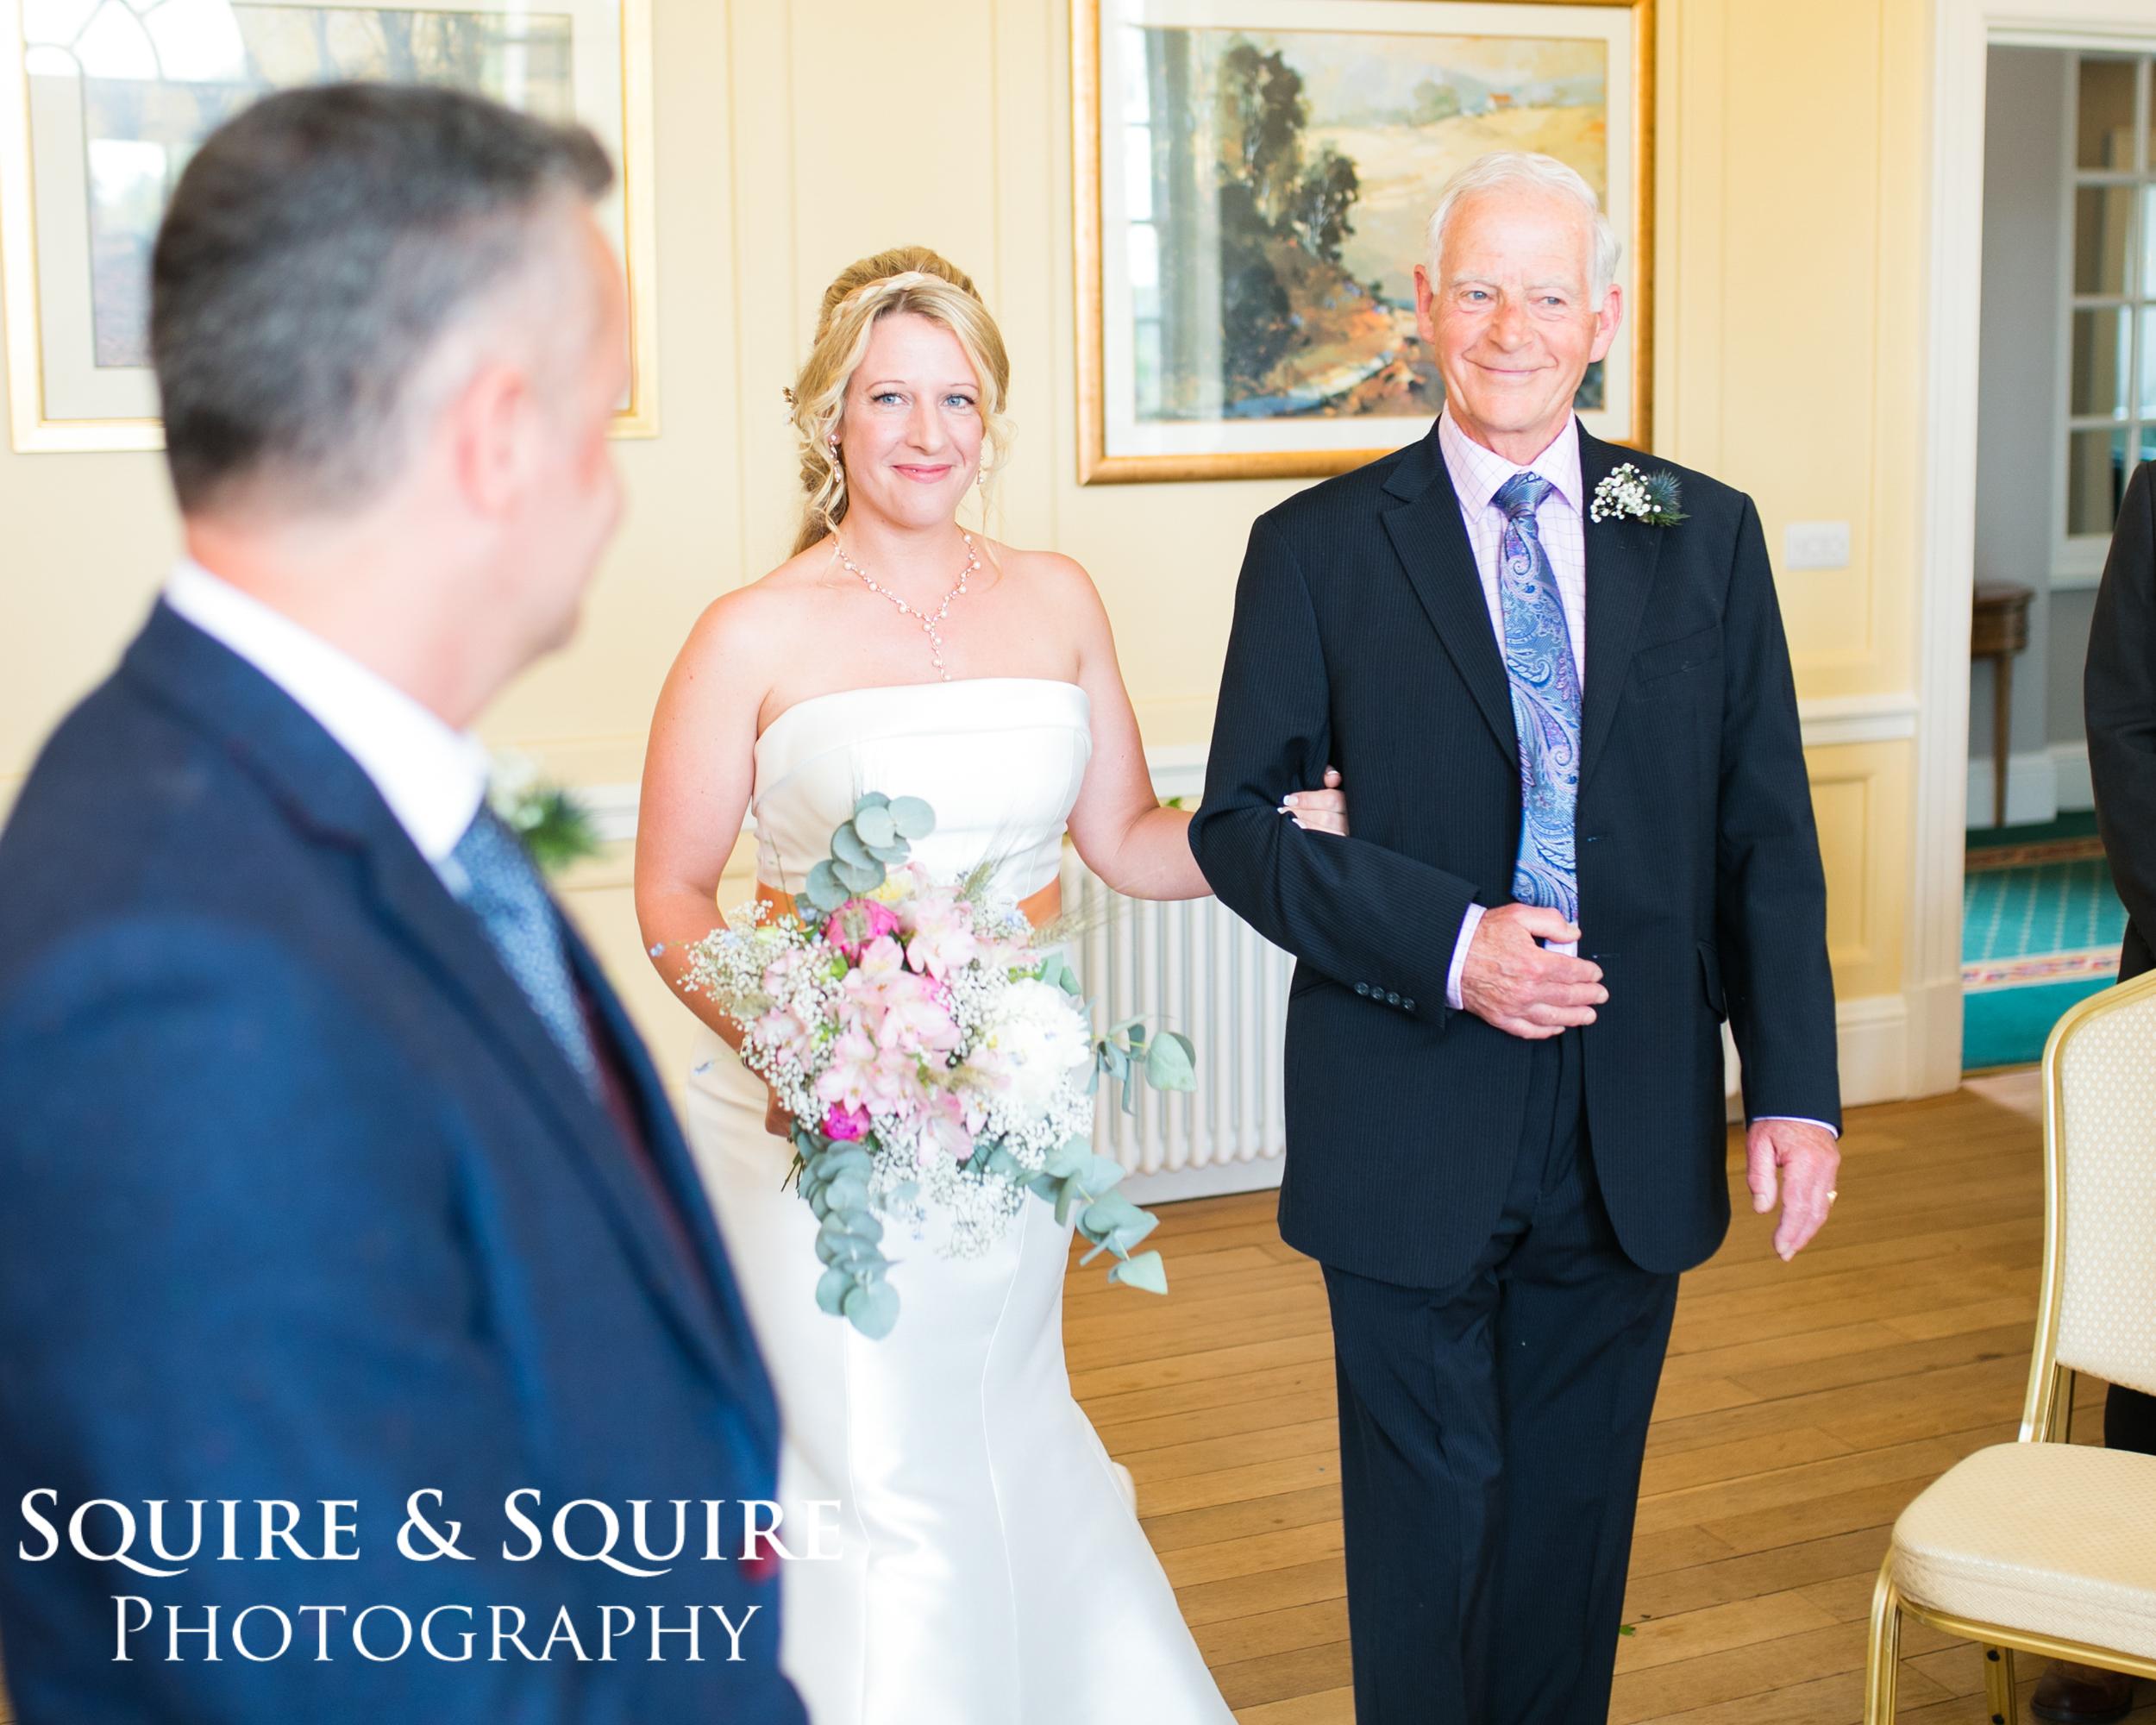 wedding_photography_catthorpe Manor (27 of 66).jpg